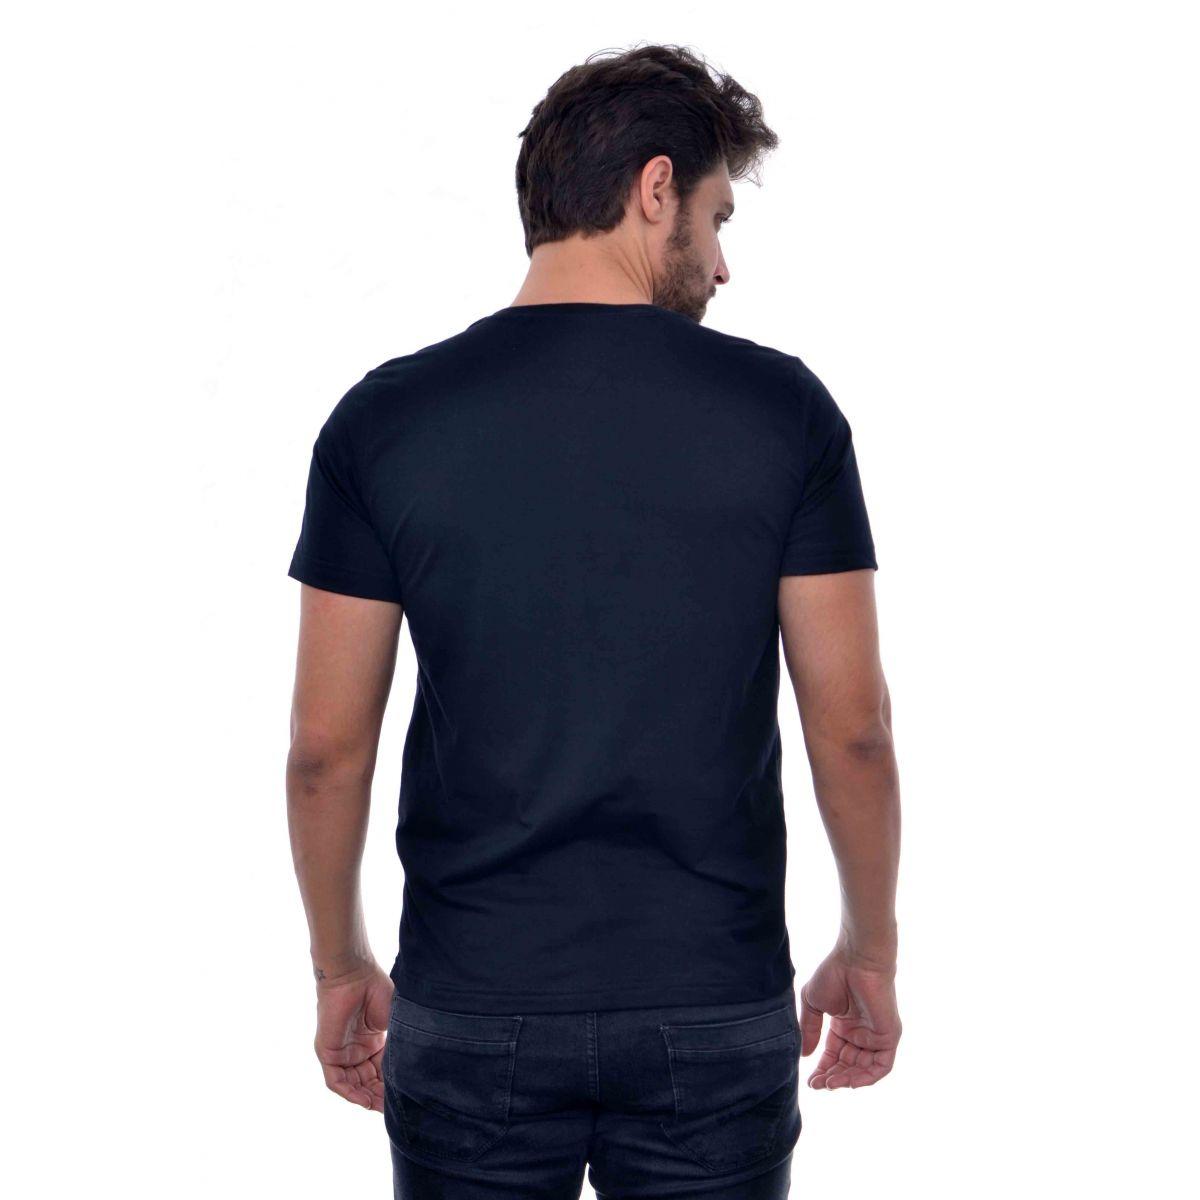 Camiseta Basic TH Azul Marinho  - Ca Brasileira